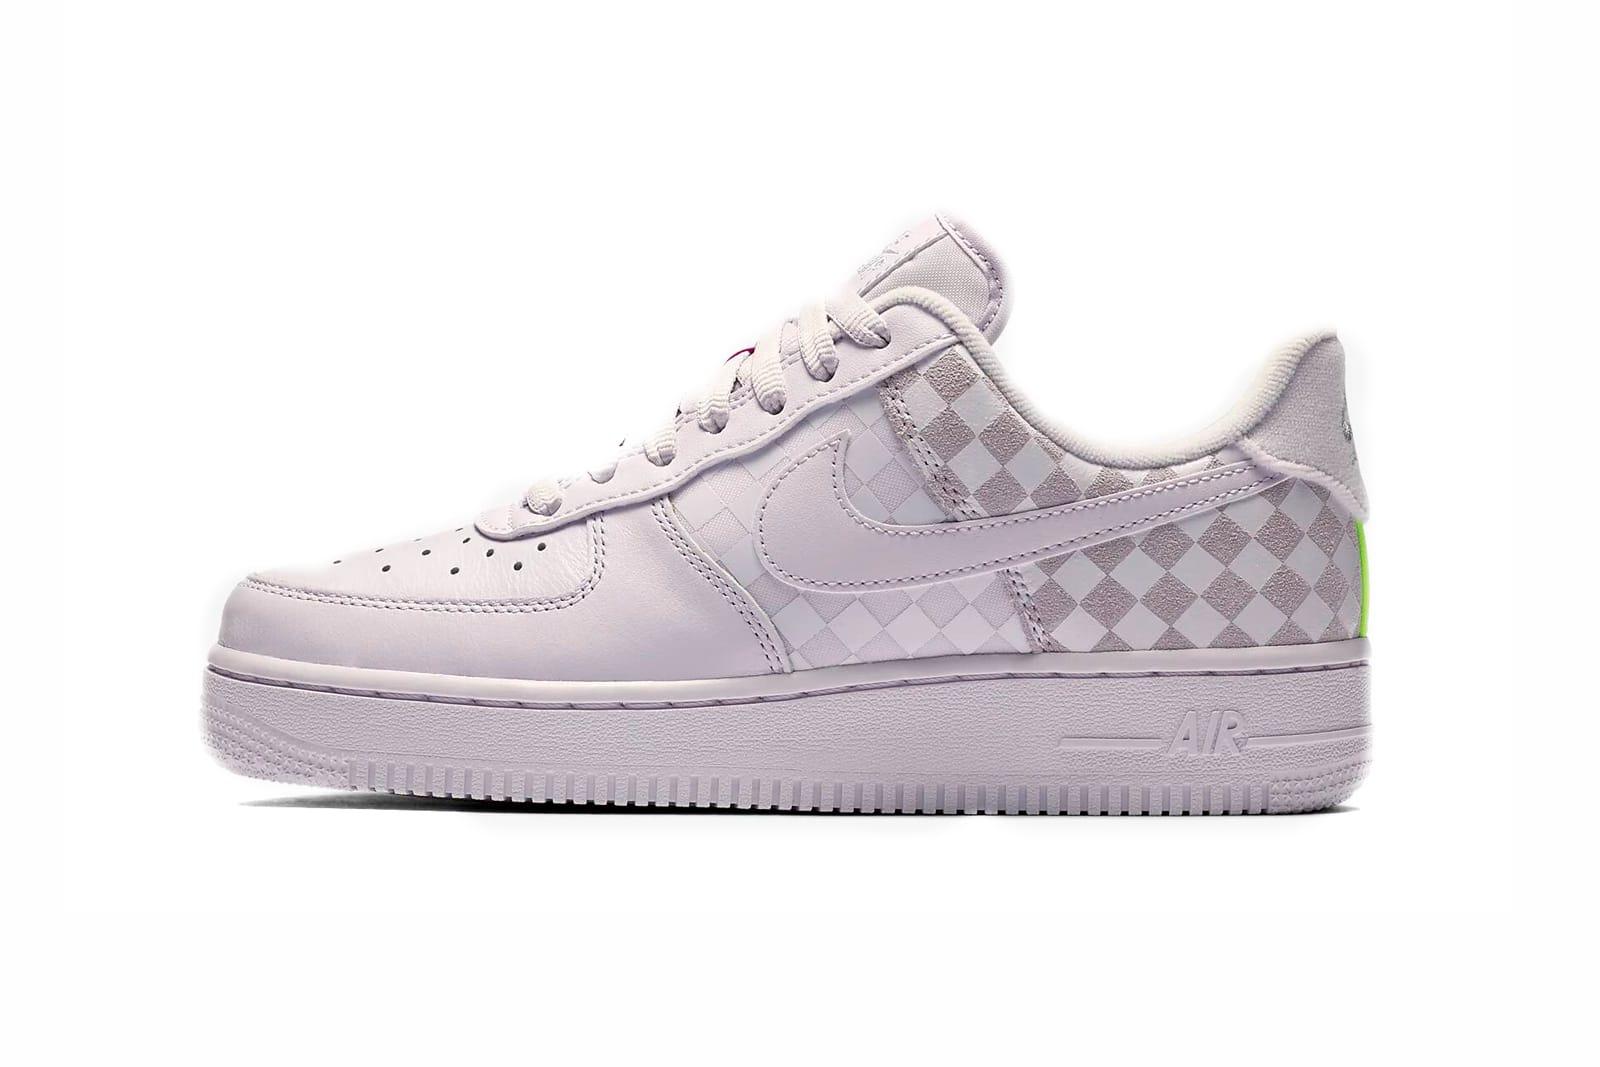 Nike Air Force 1 Low in Pastel \